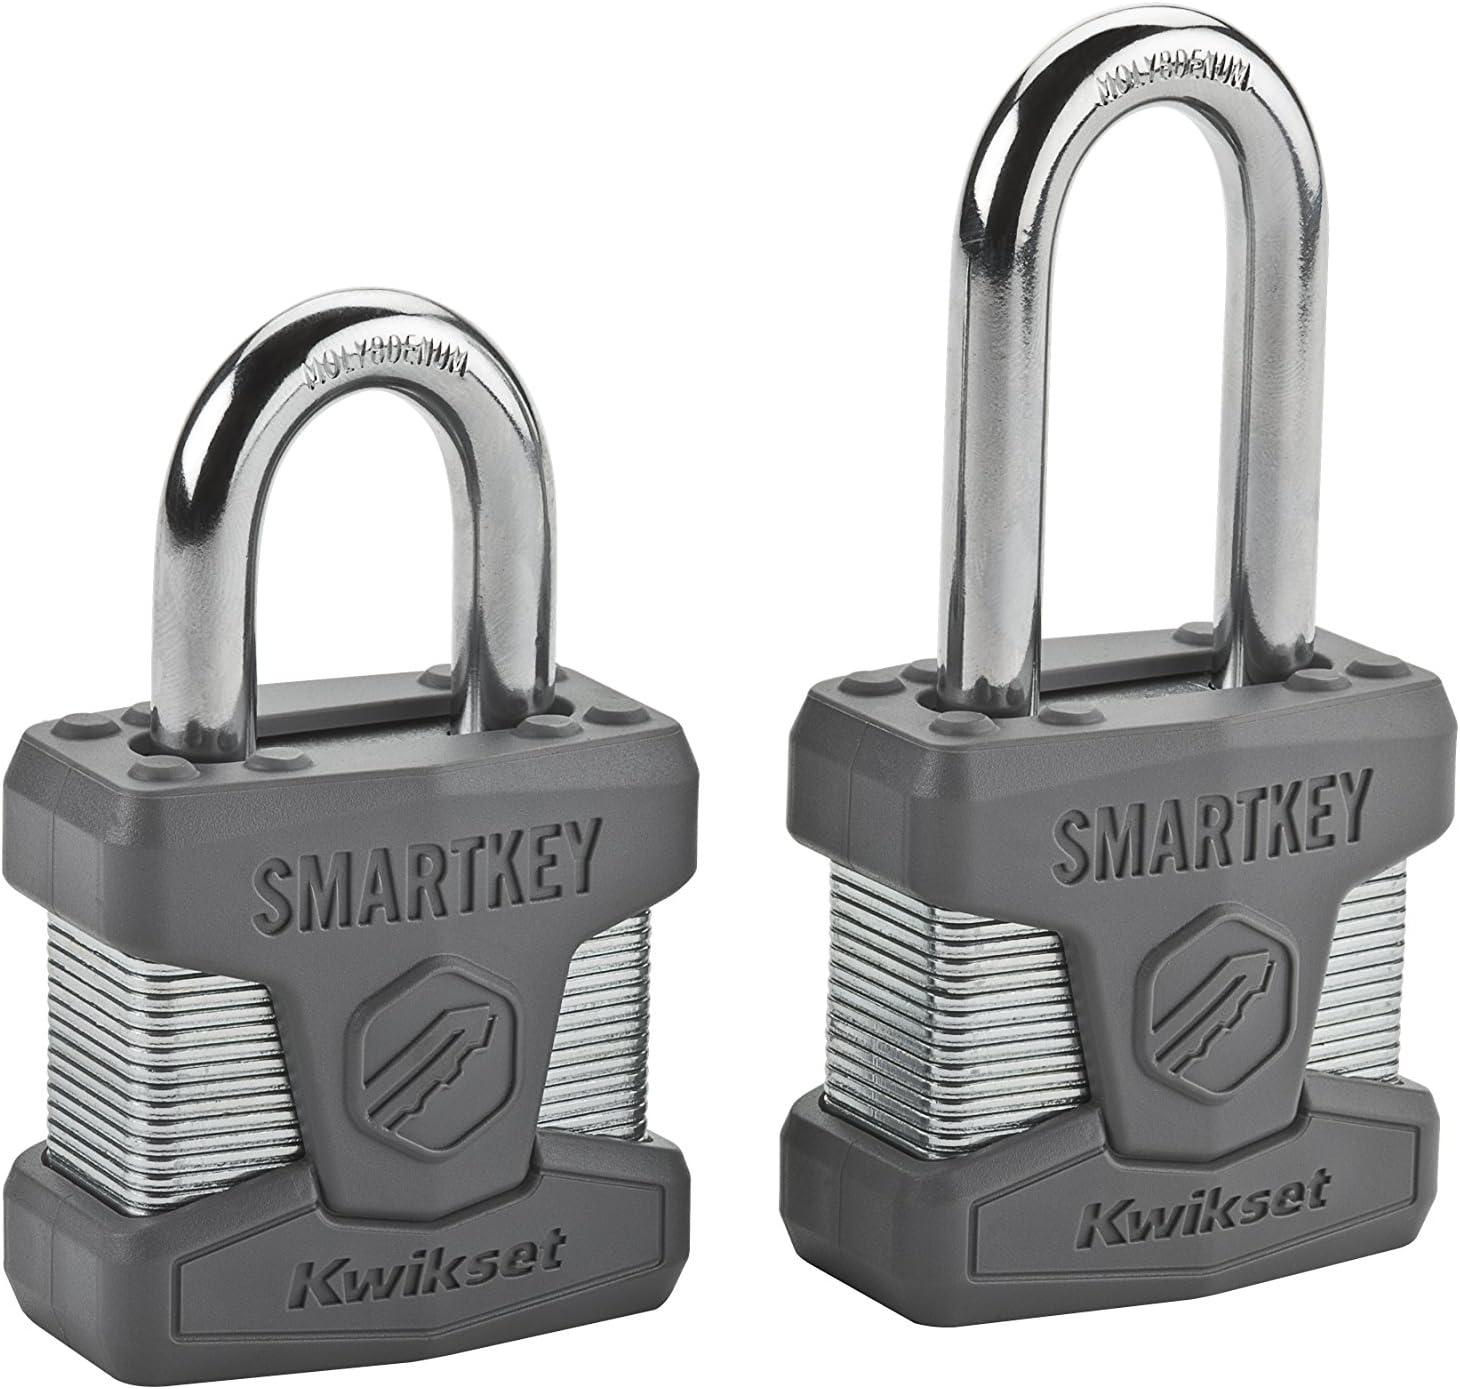 Amazon.com: Kwikset. Candado de latón SmartKey ...